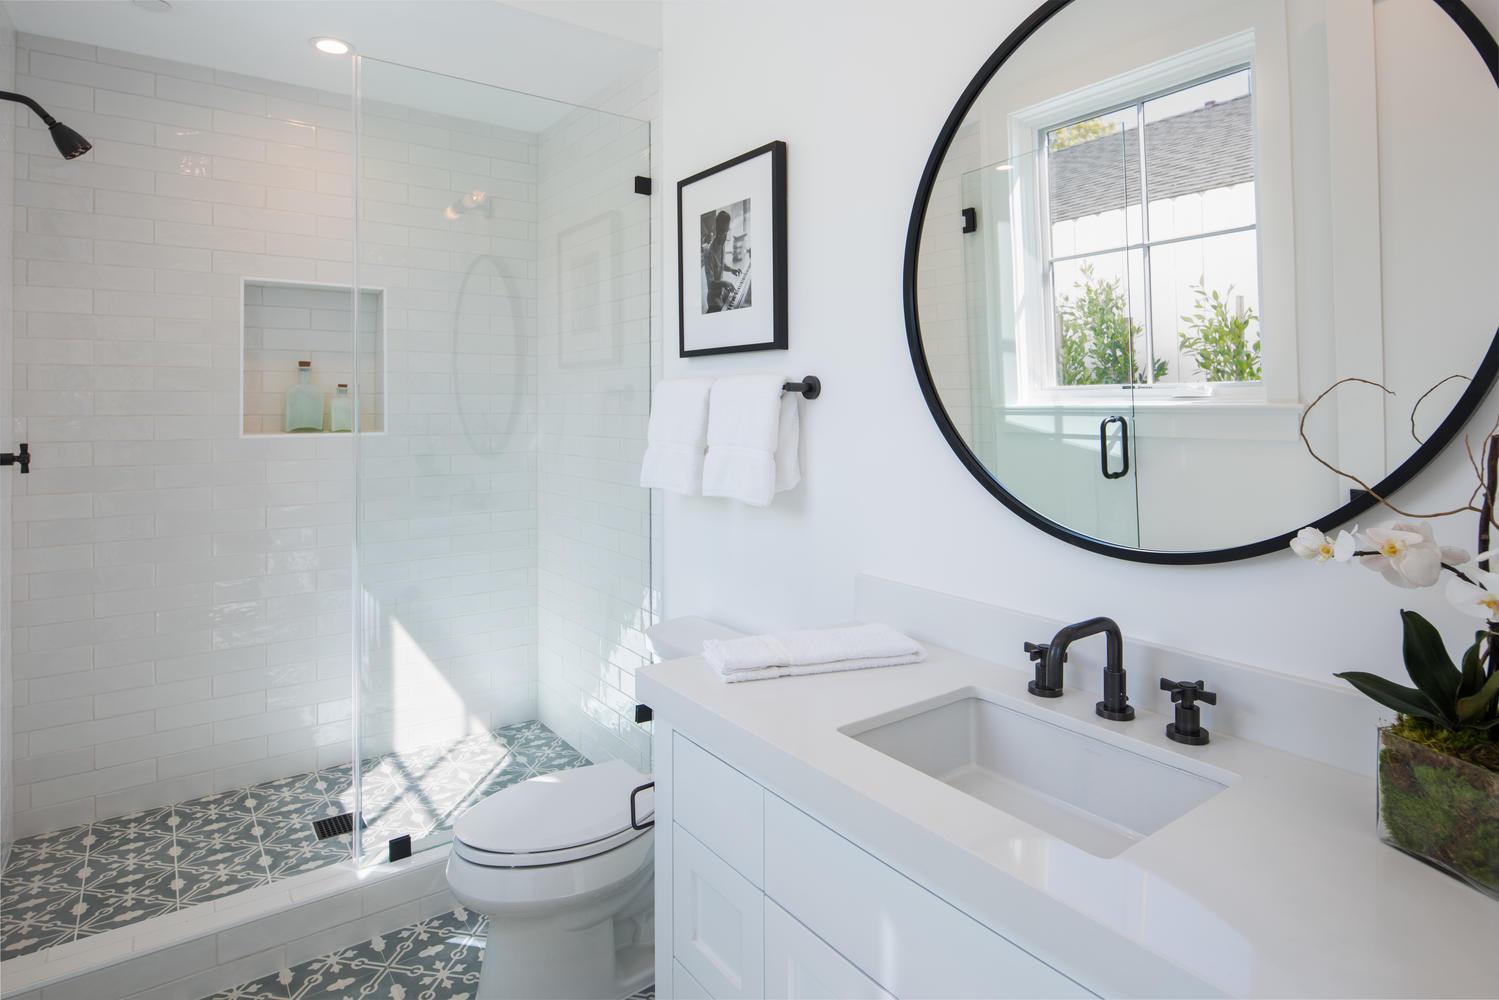 1046 Galloway St Pacific-large-017-3-Bathroom-1499x1000-72dpi.jpg